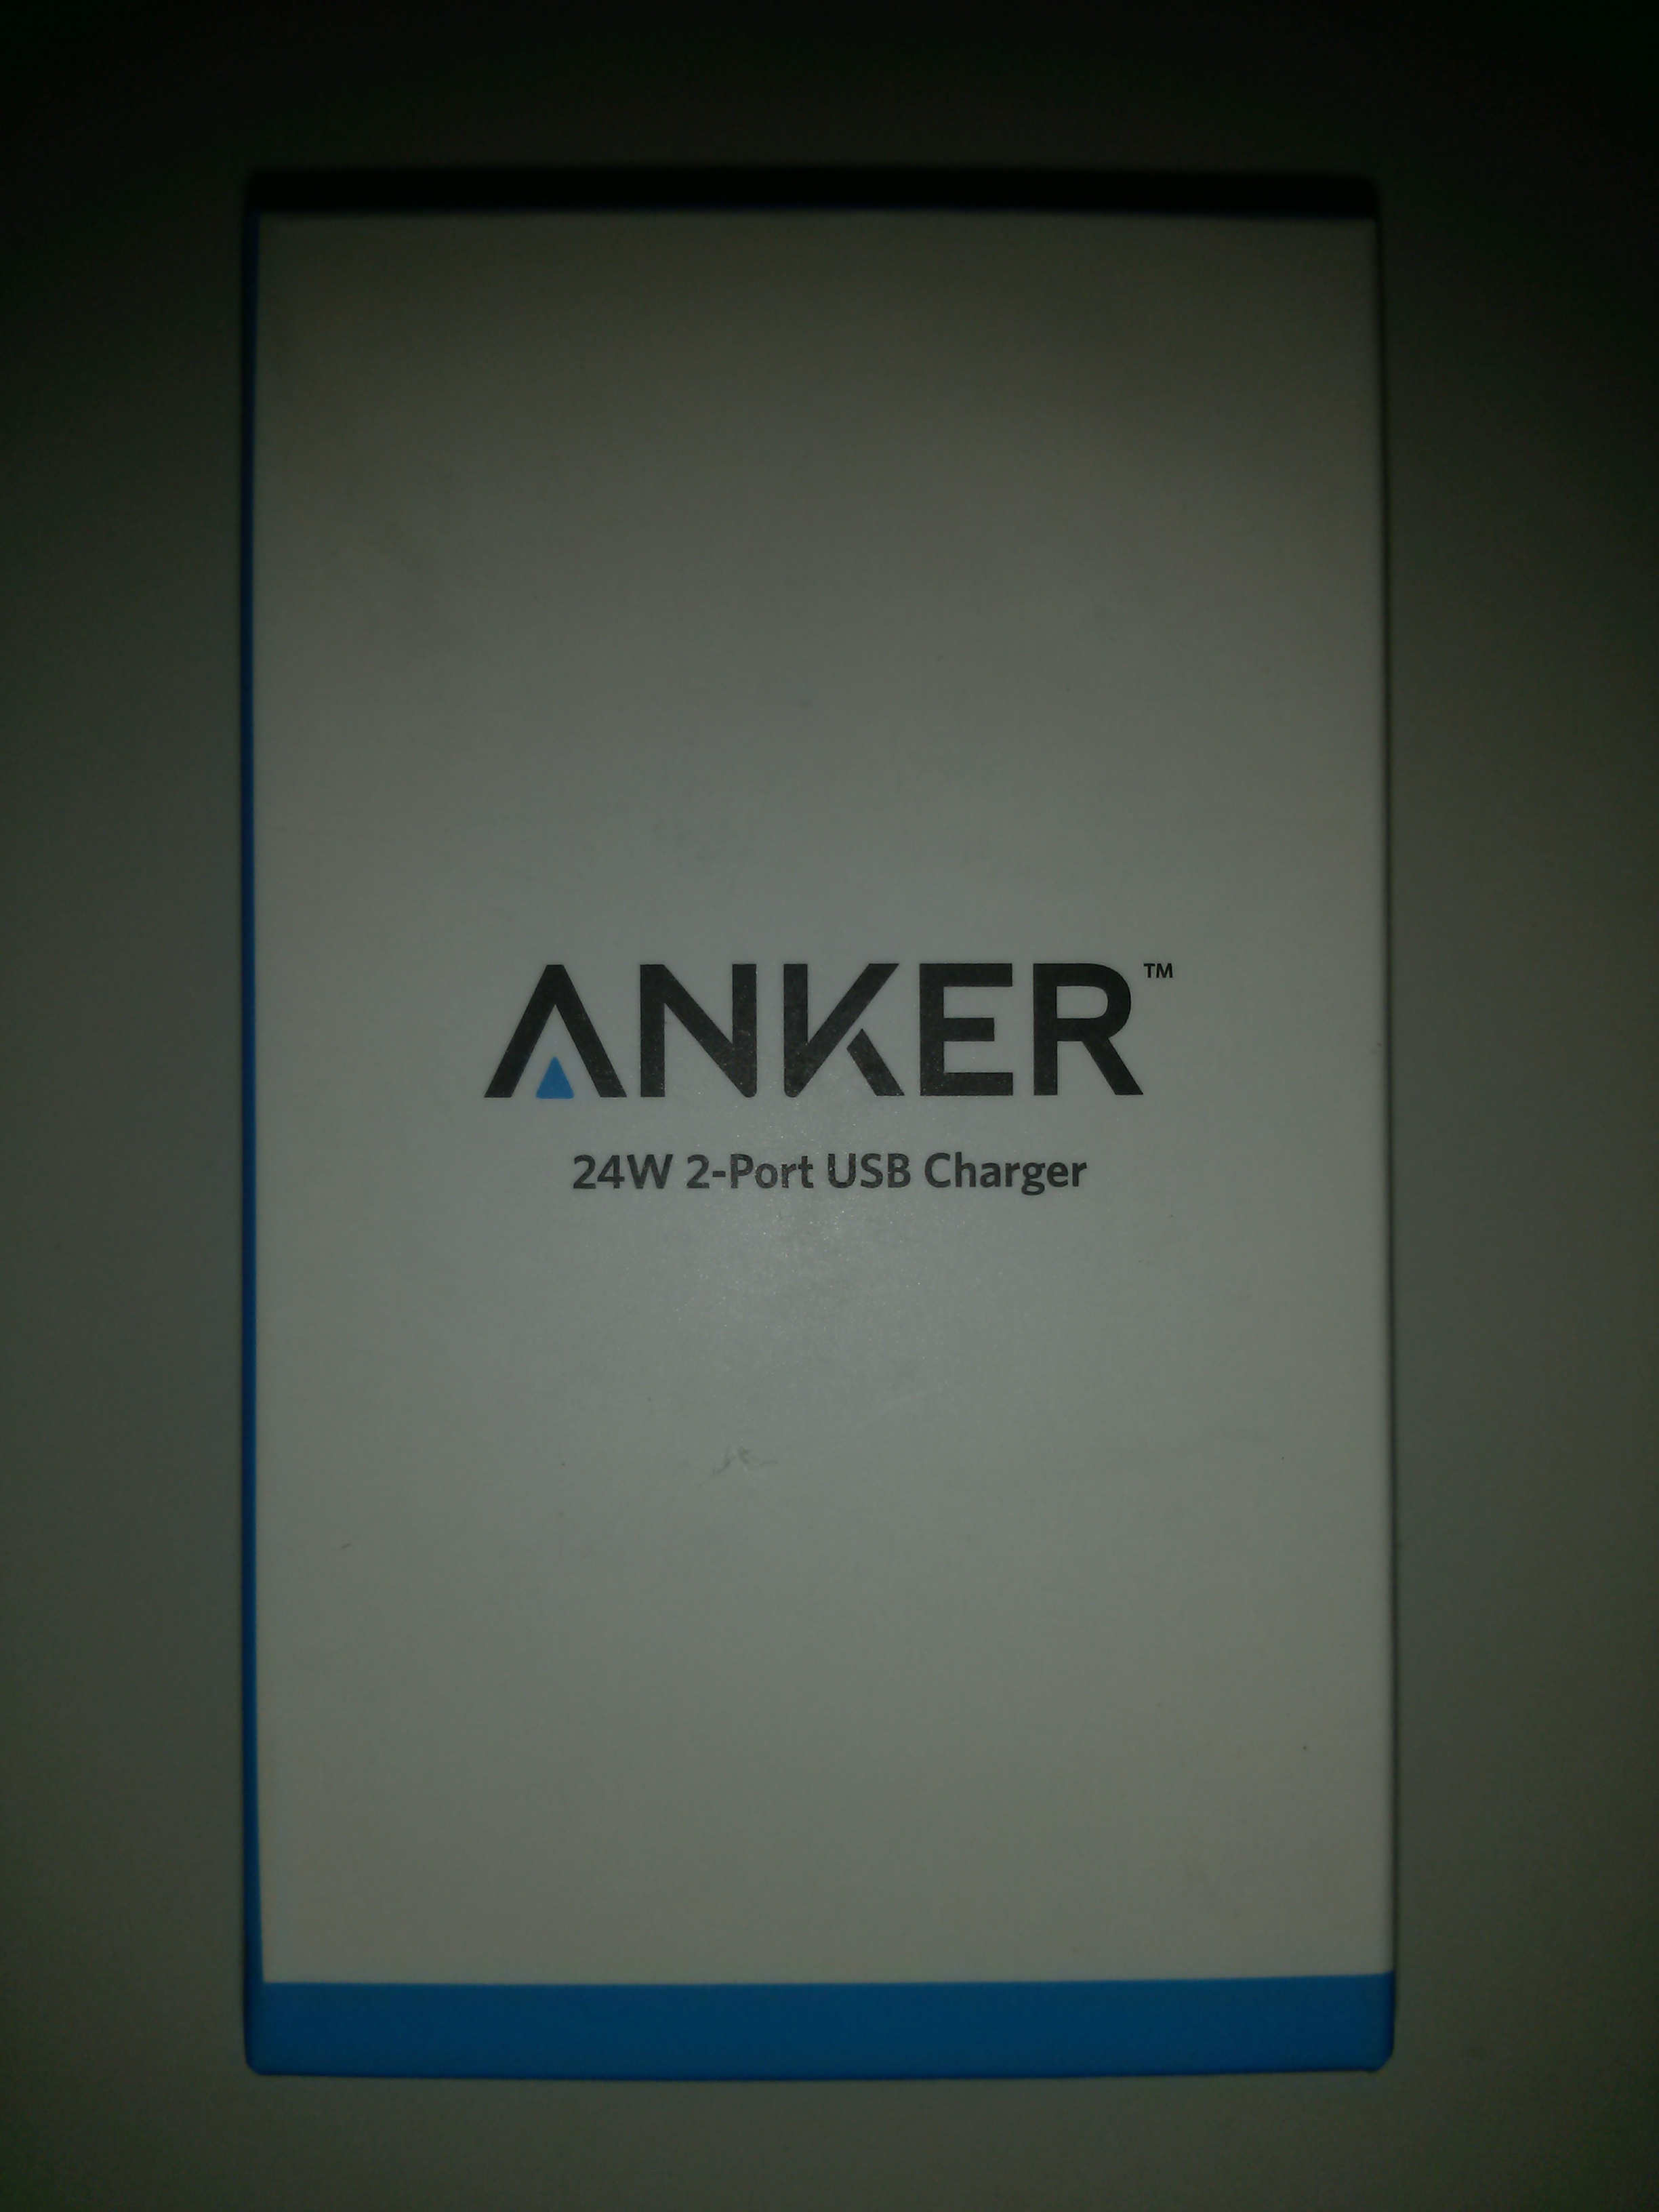 Anker_24W_2ポート_USB急速充電器_箱